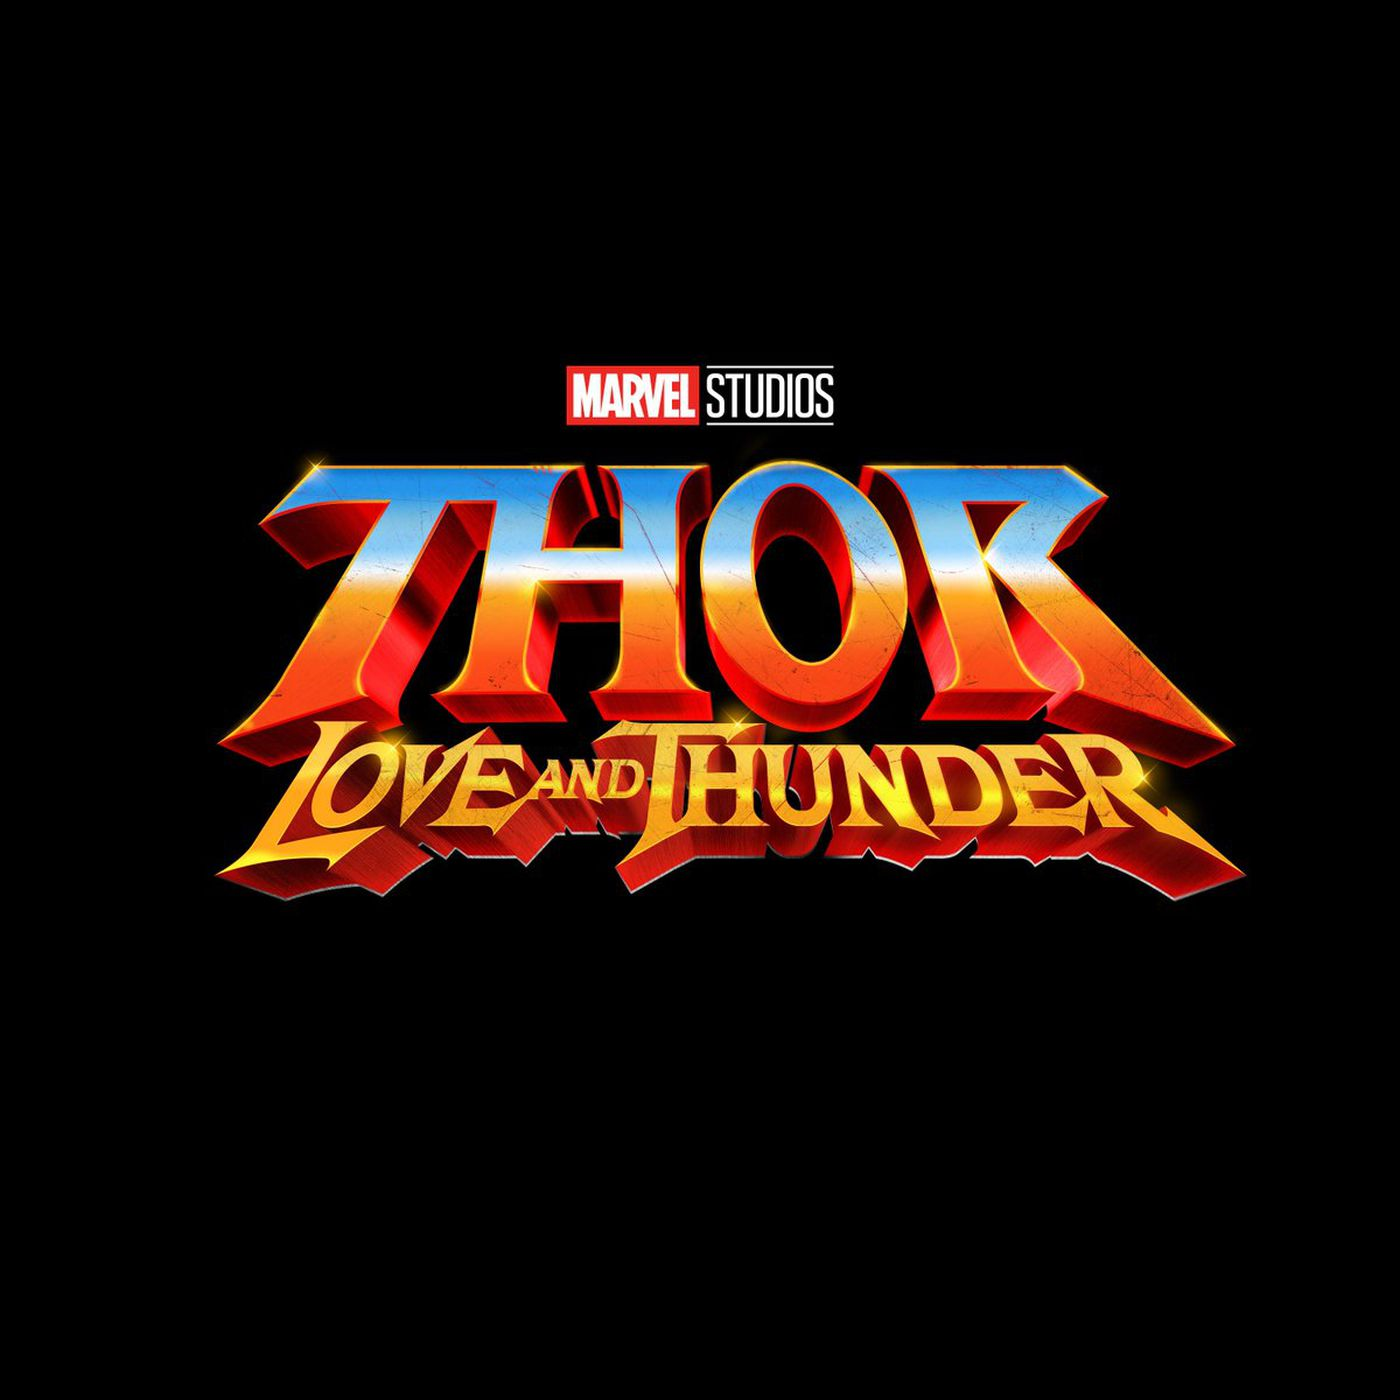 Best Marvel Titles 2020 Marvel Phase 4: Black Widow, Doctor Strange 2, Thor 4 schedule